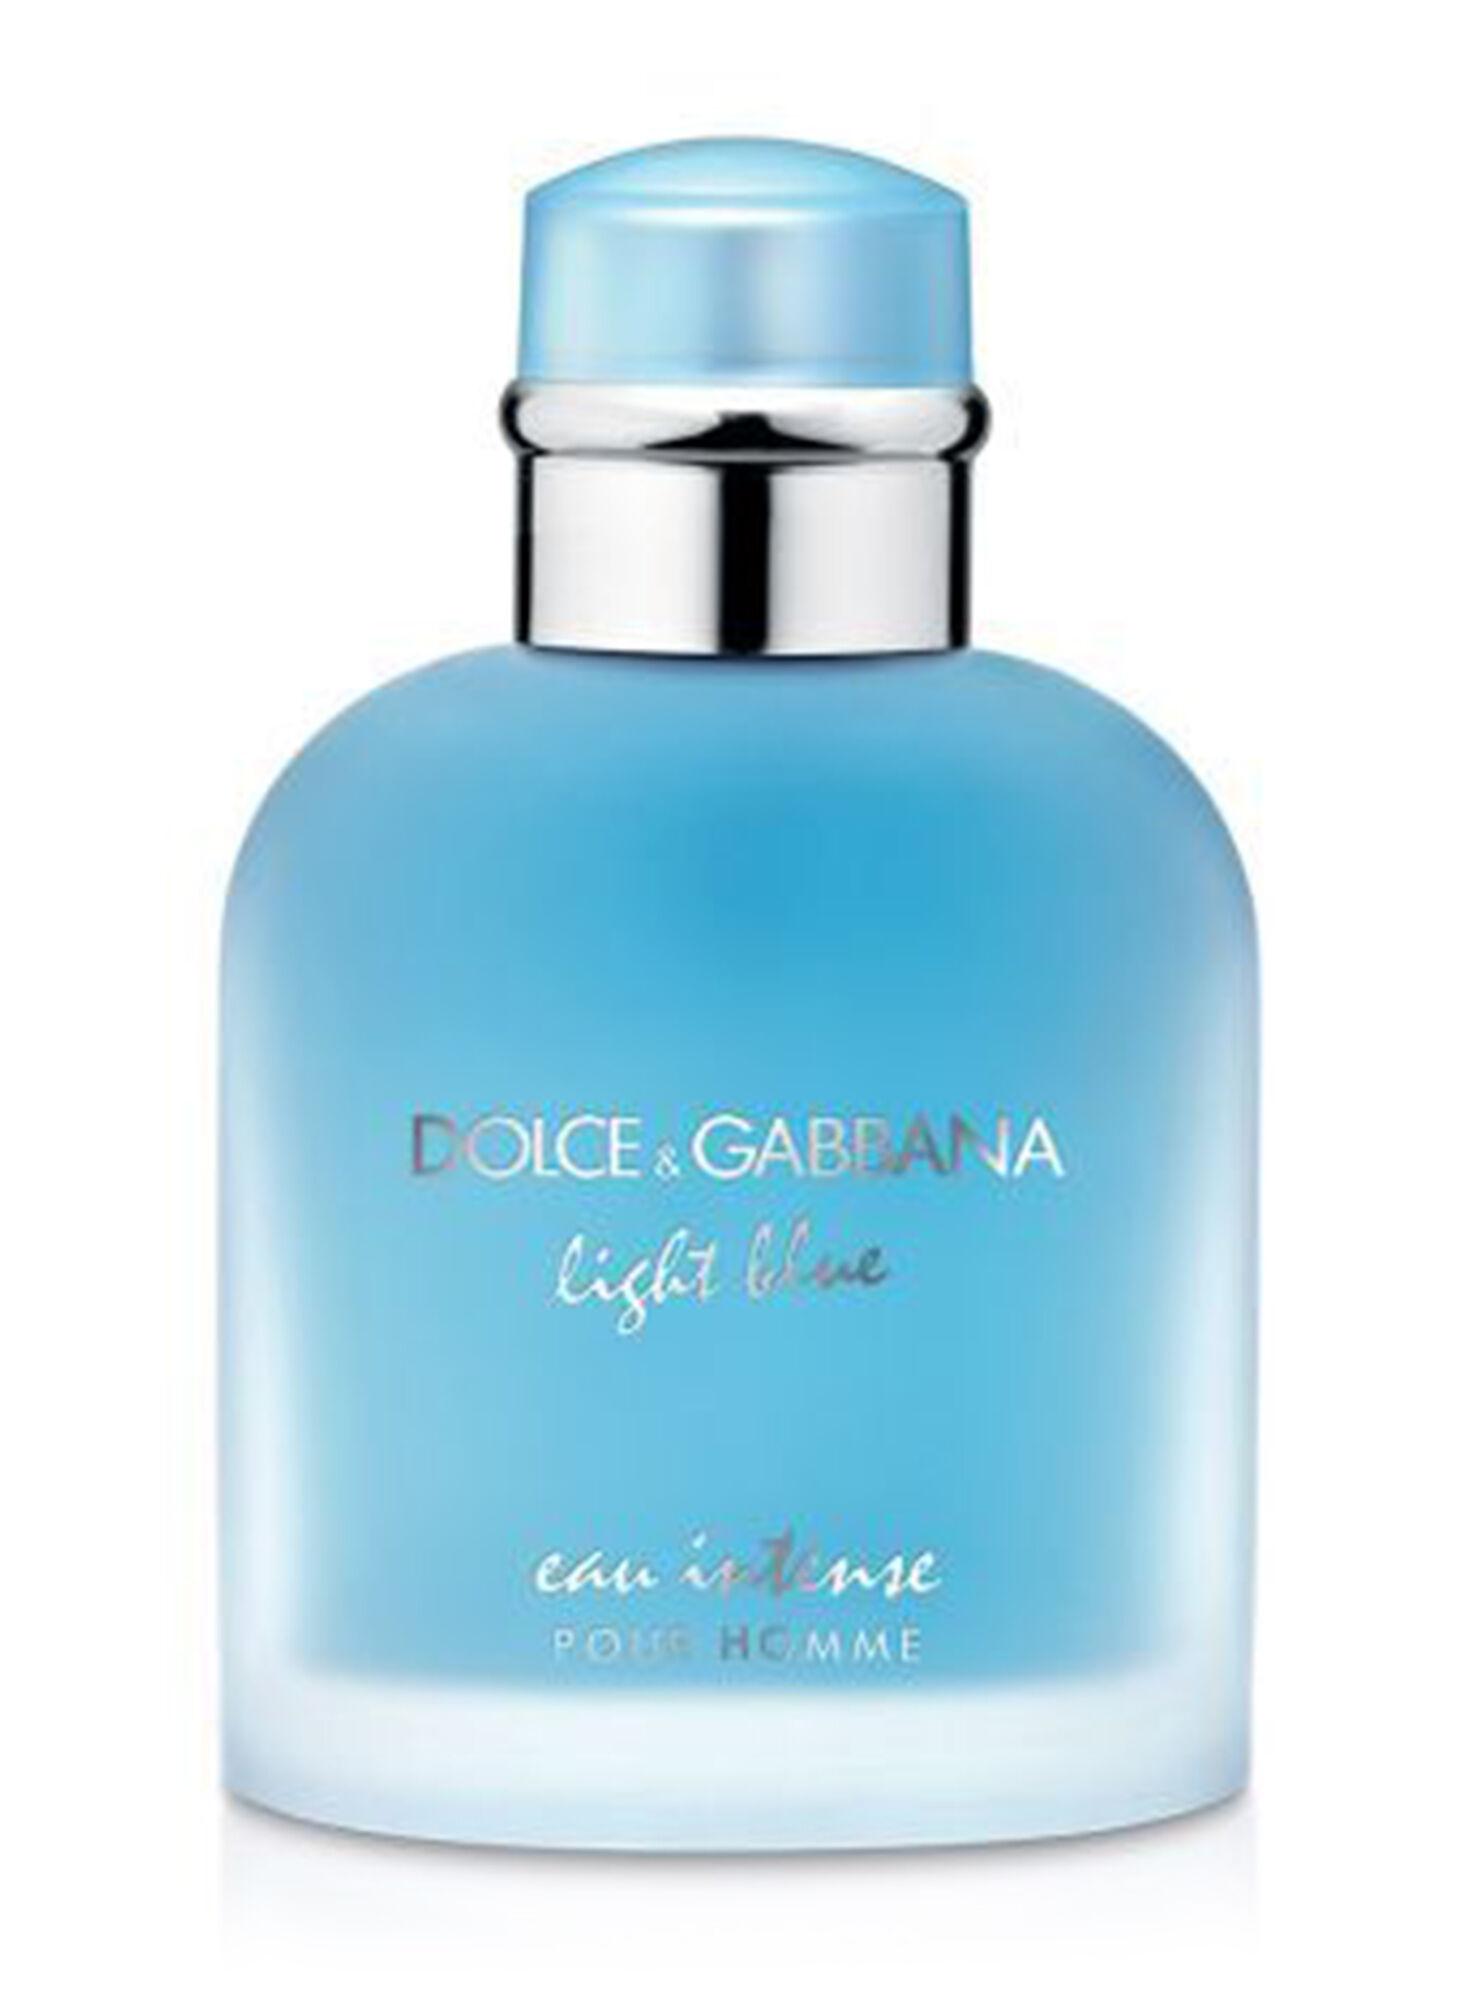 dormitorio de sal marina sw Perfume Dolce Gabbana Light Blue Pour Homme Eau Intense EDP 100 Ml